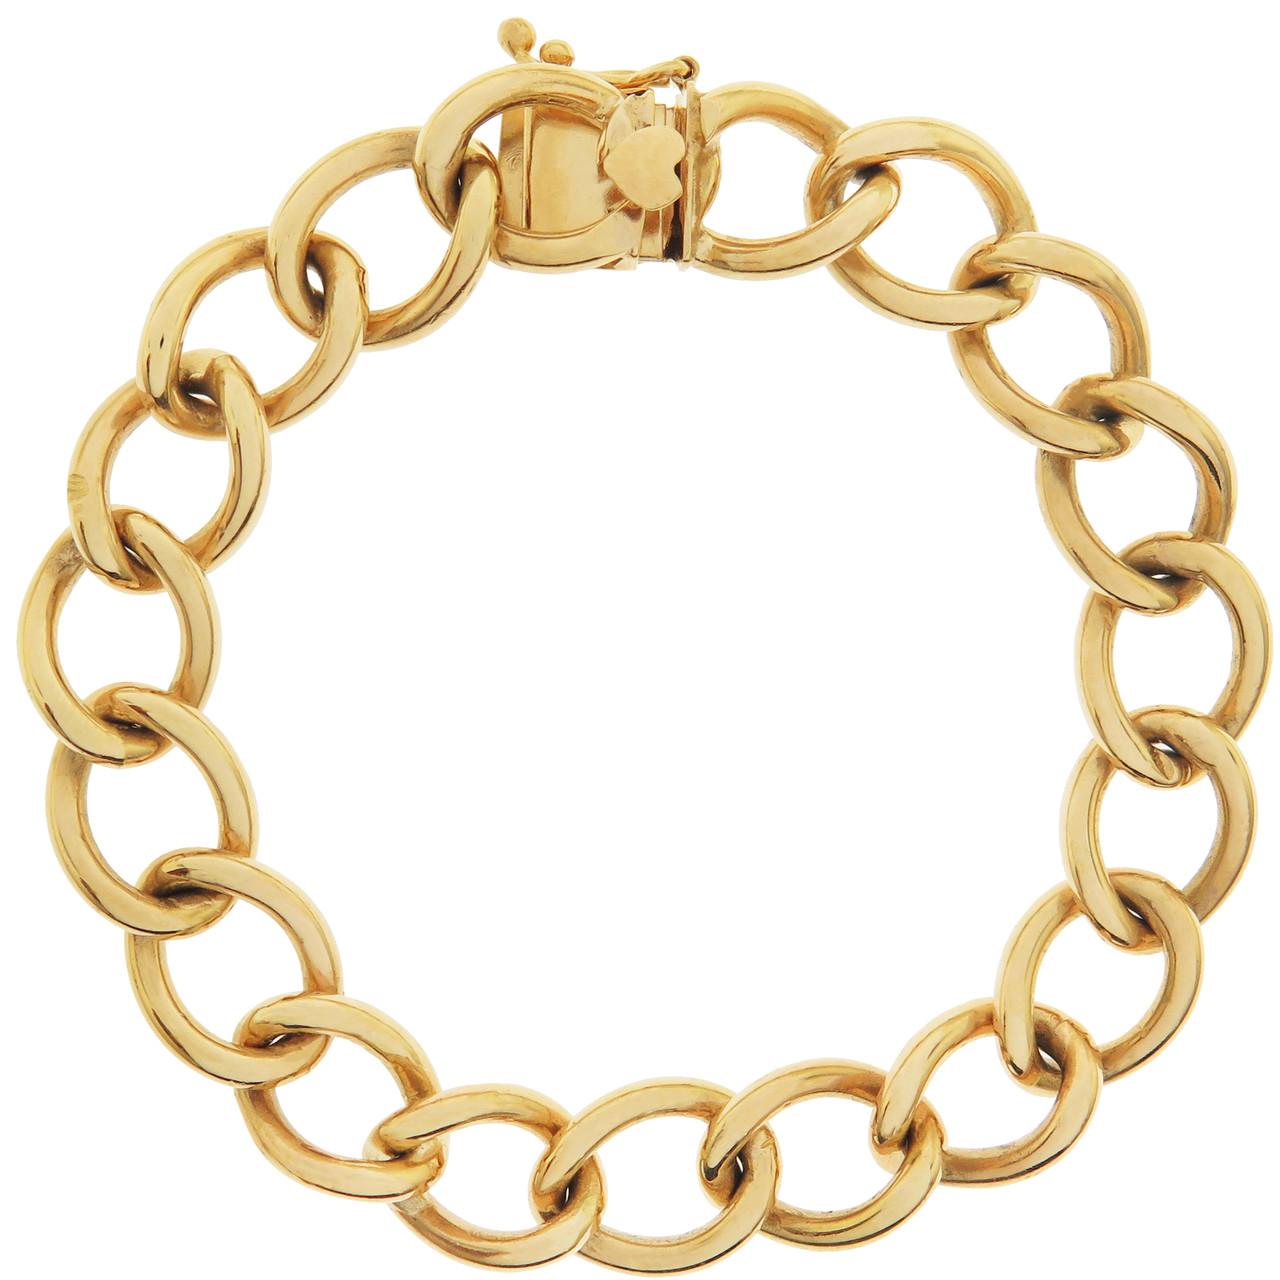 ec090dec267f8 Vintage Heavy Link with Heart Clasp 14K Gold Charm Bracelet ...